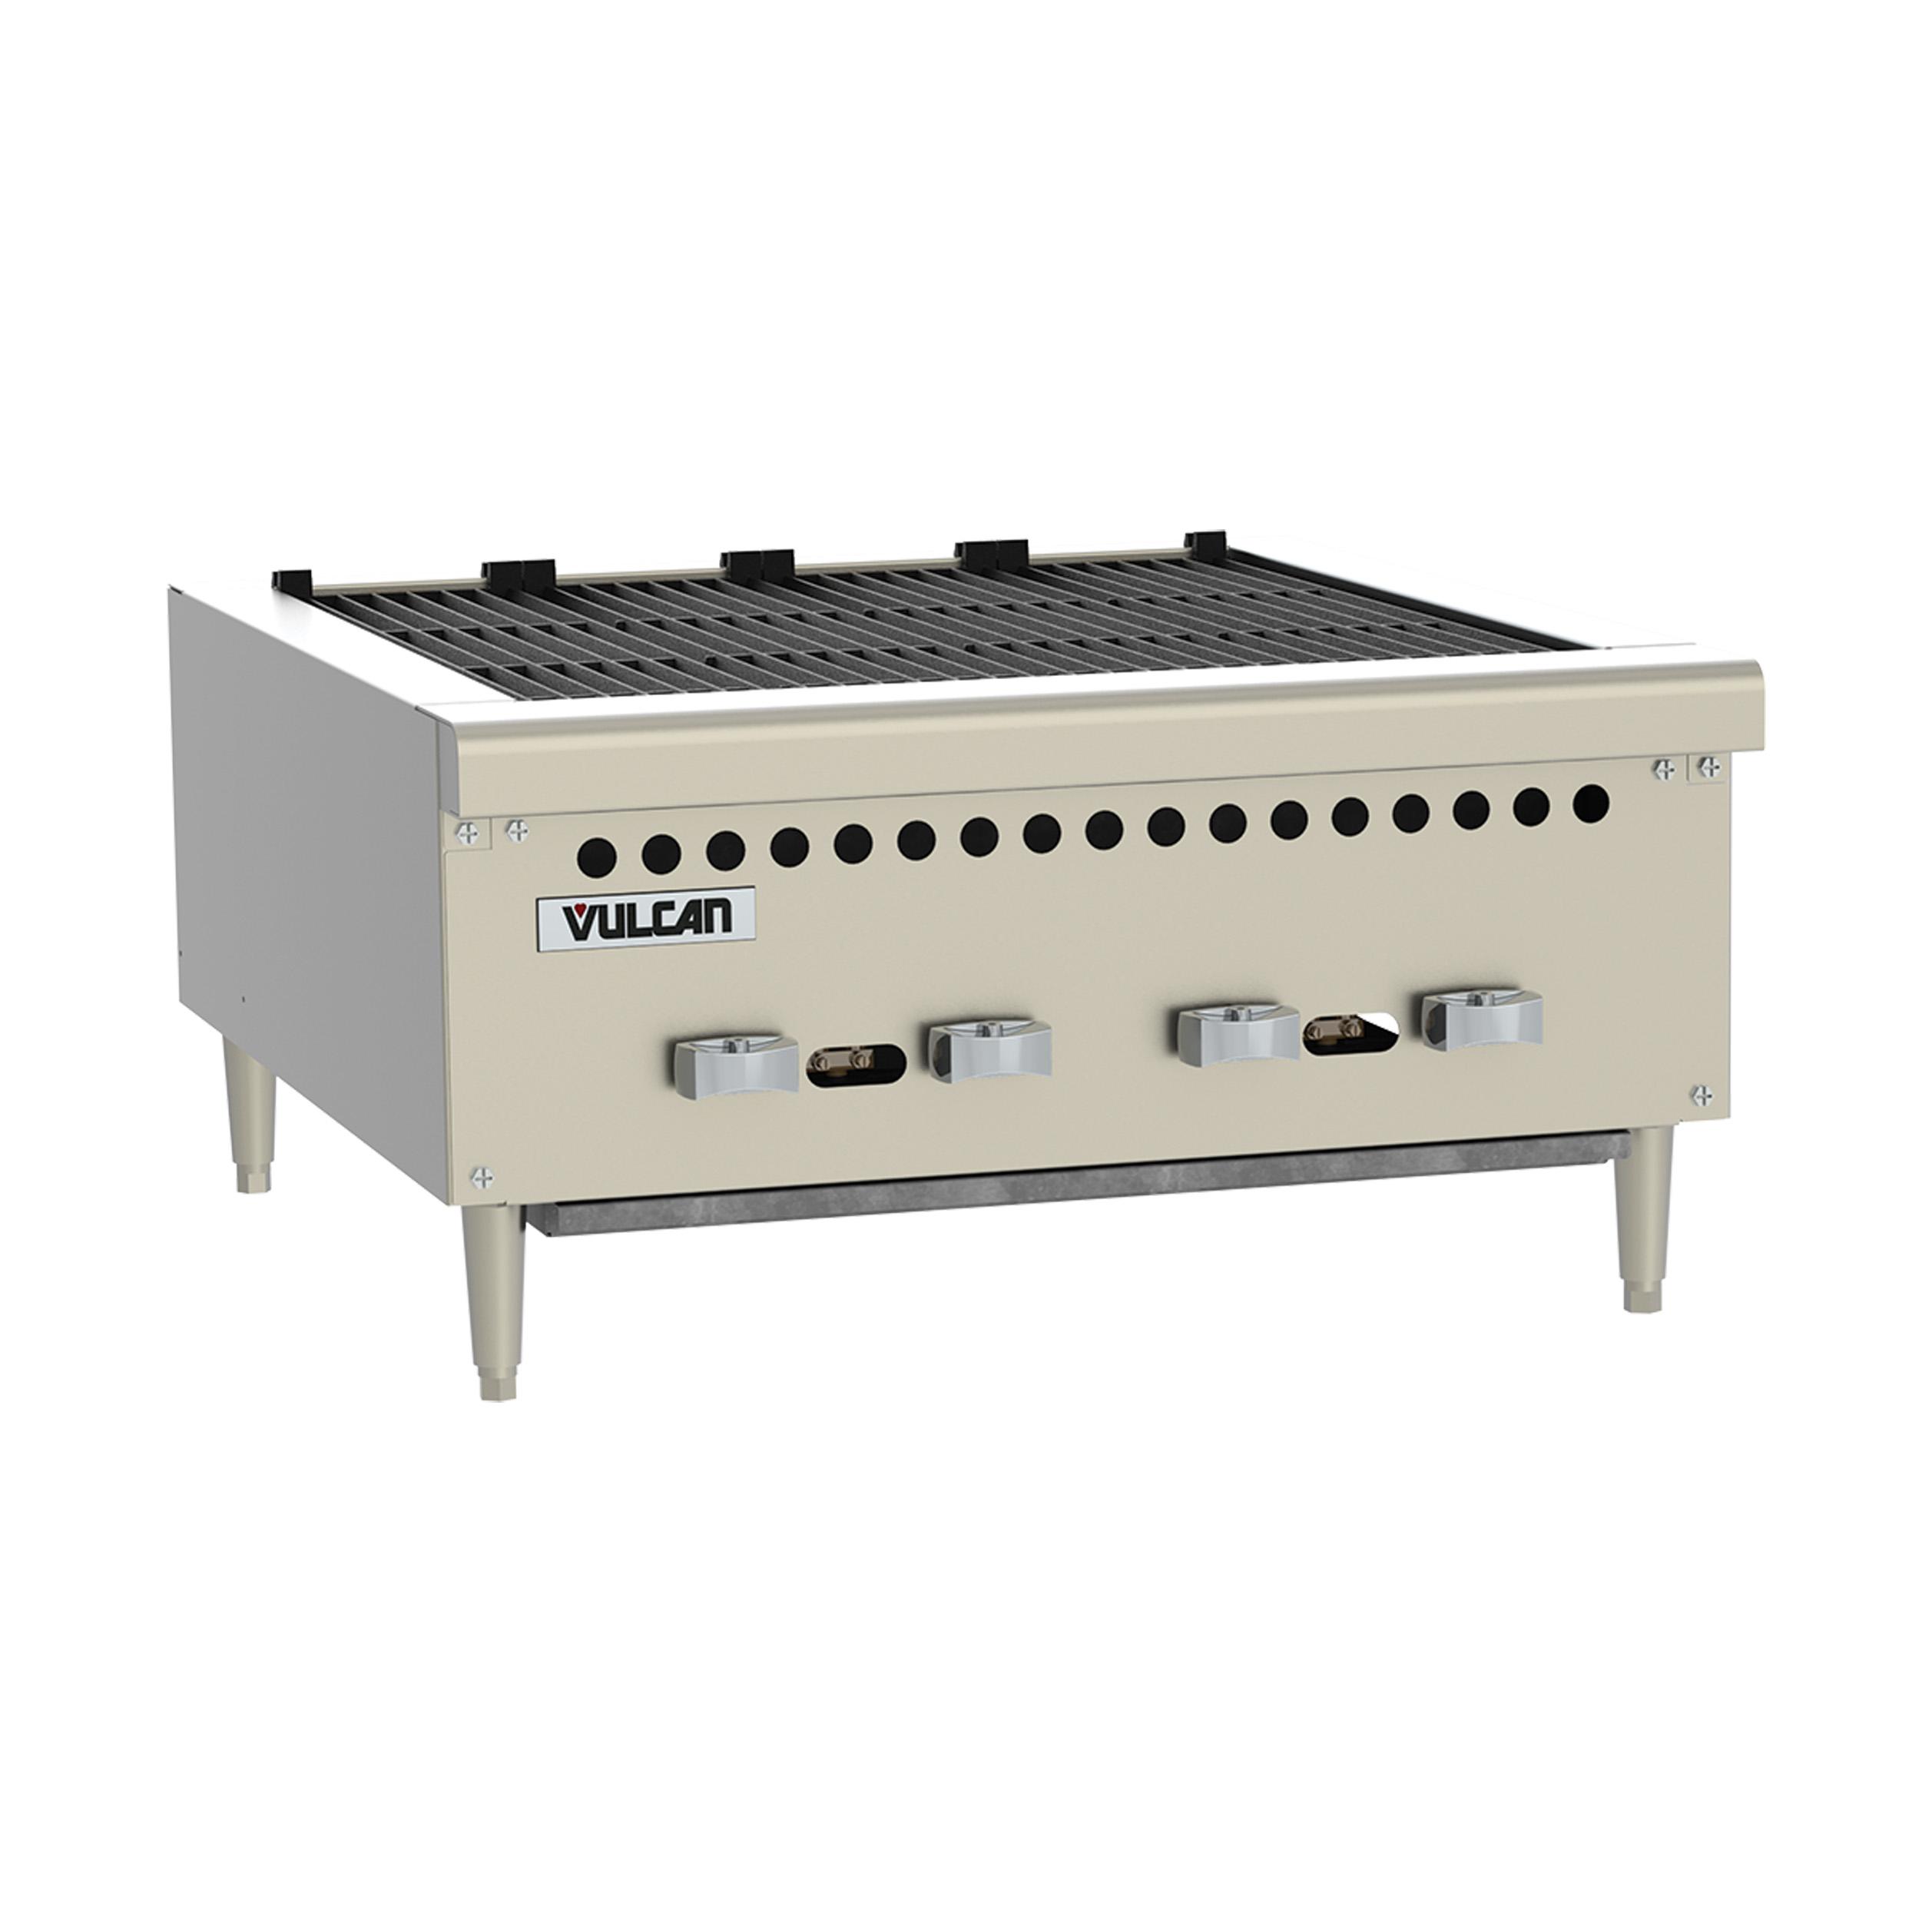 VCRB36 Vulcan charbroiler, gas, countertop